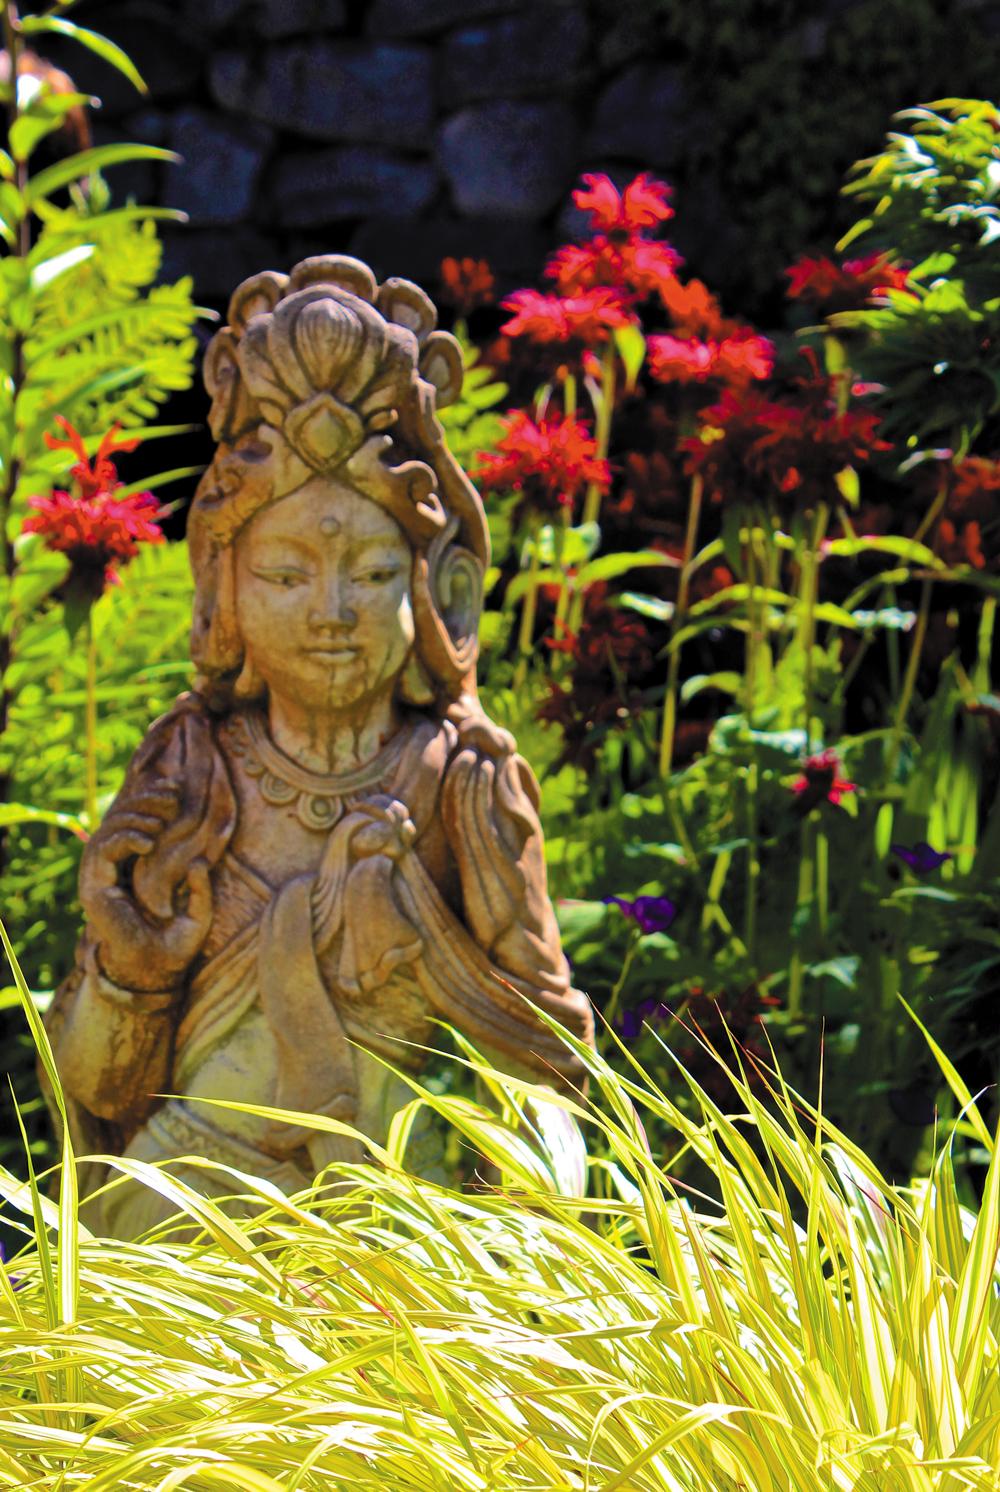 gardening-as-healing-cancer-survivors-garden